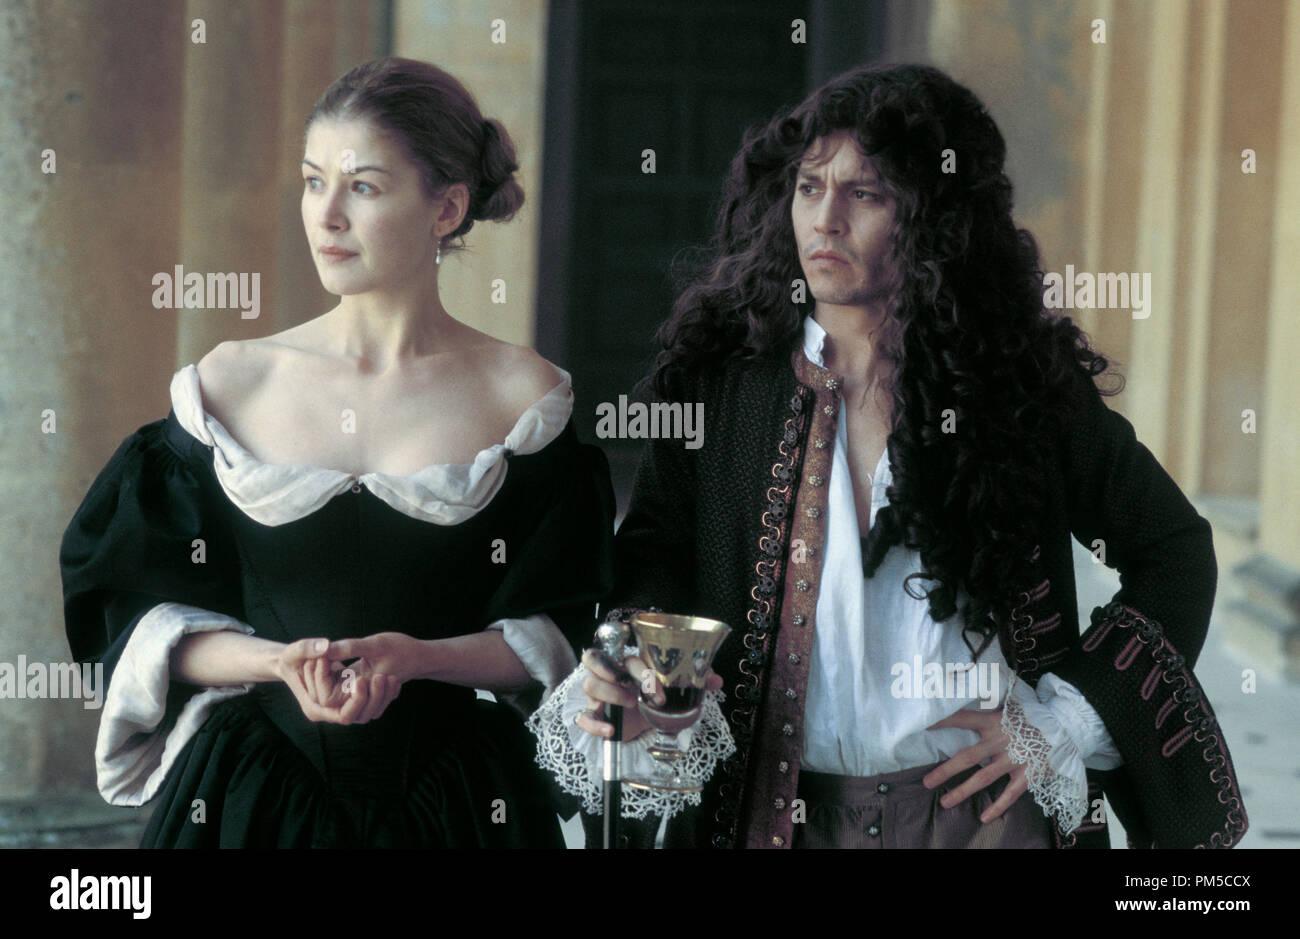 Film Still from 'The Libertine' Rosamund Pike, Johnny Depp © 2004 Miramax Films - Stock Image